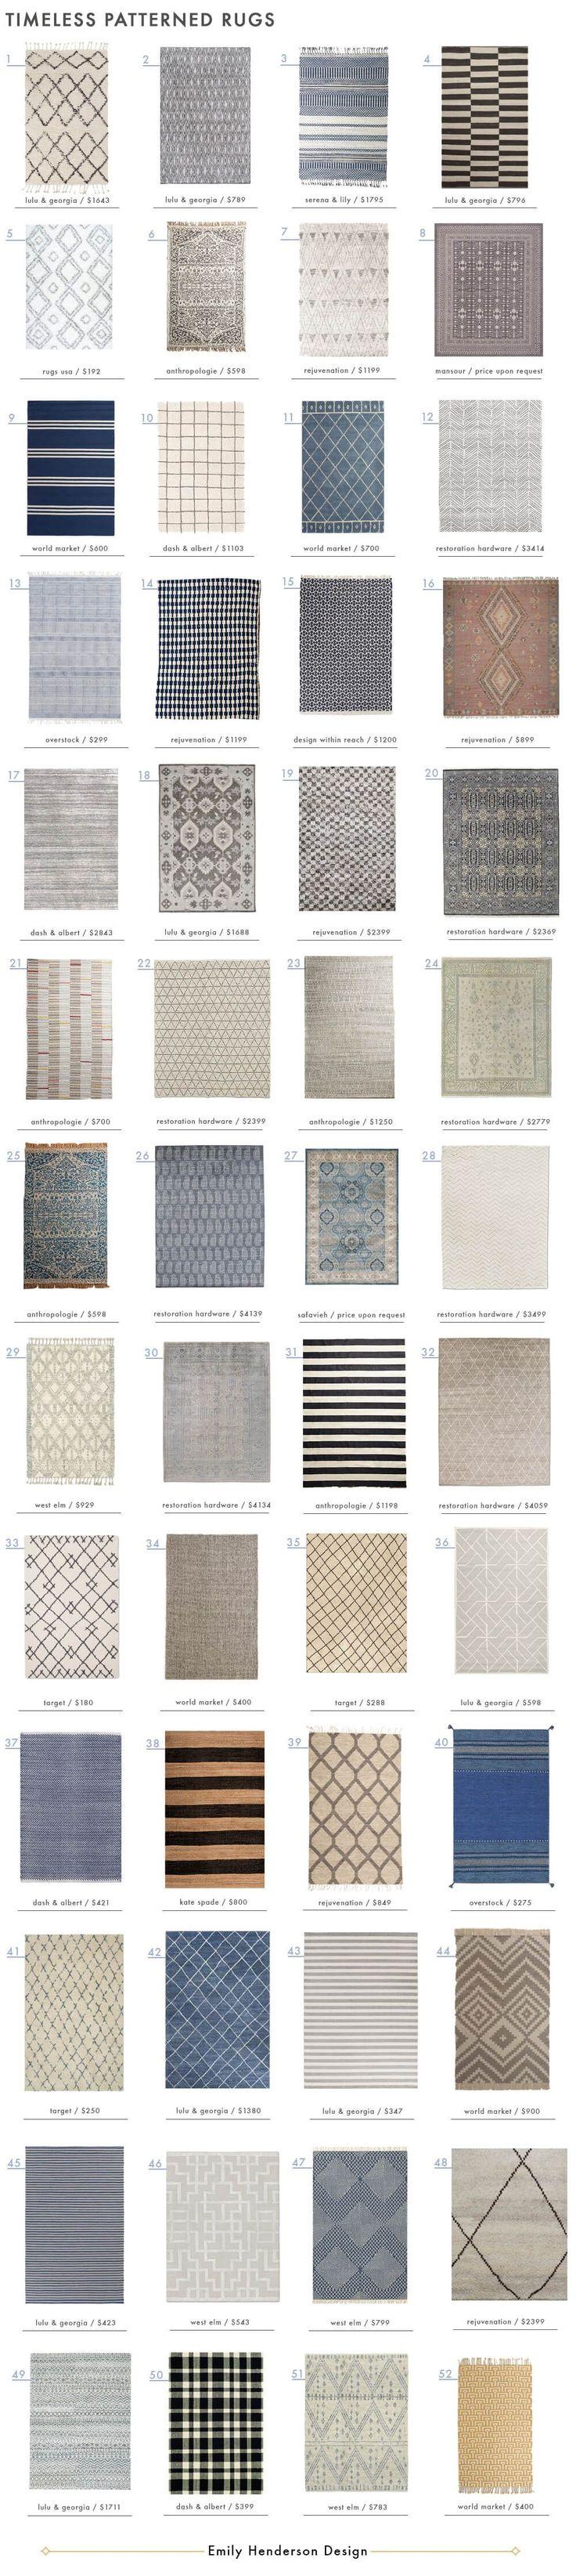 52 Timeless Patterned Rugs - Emily Henderson